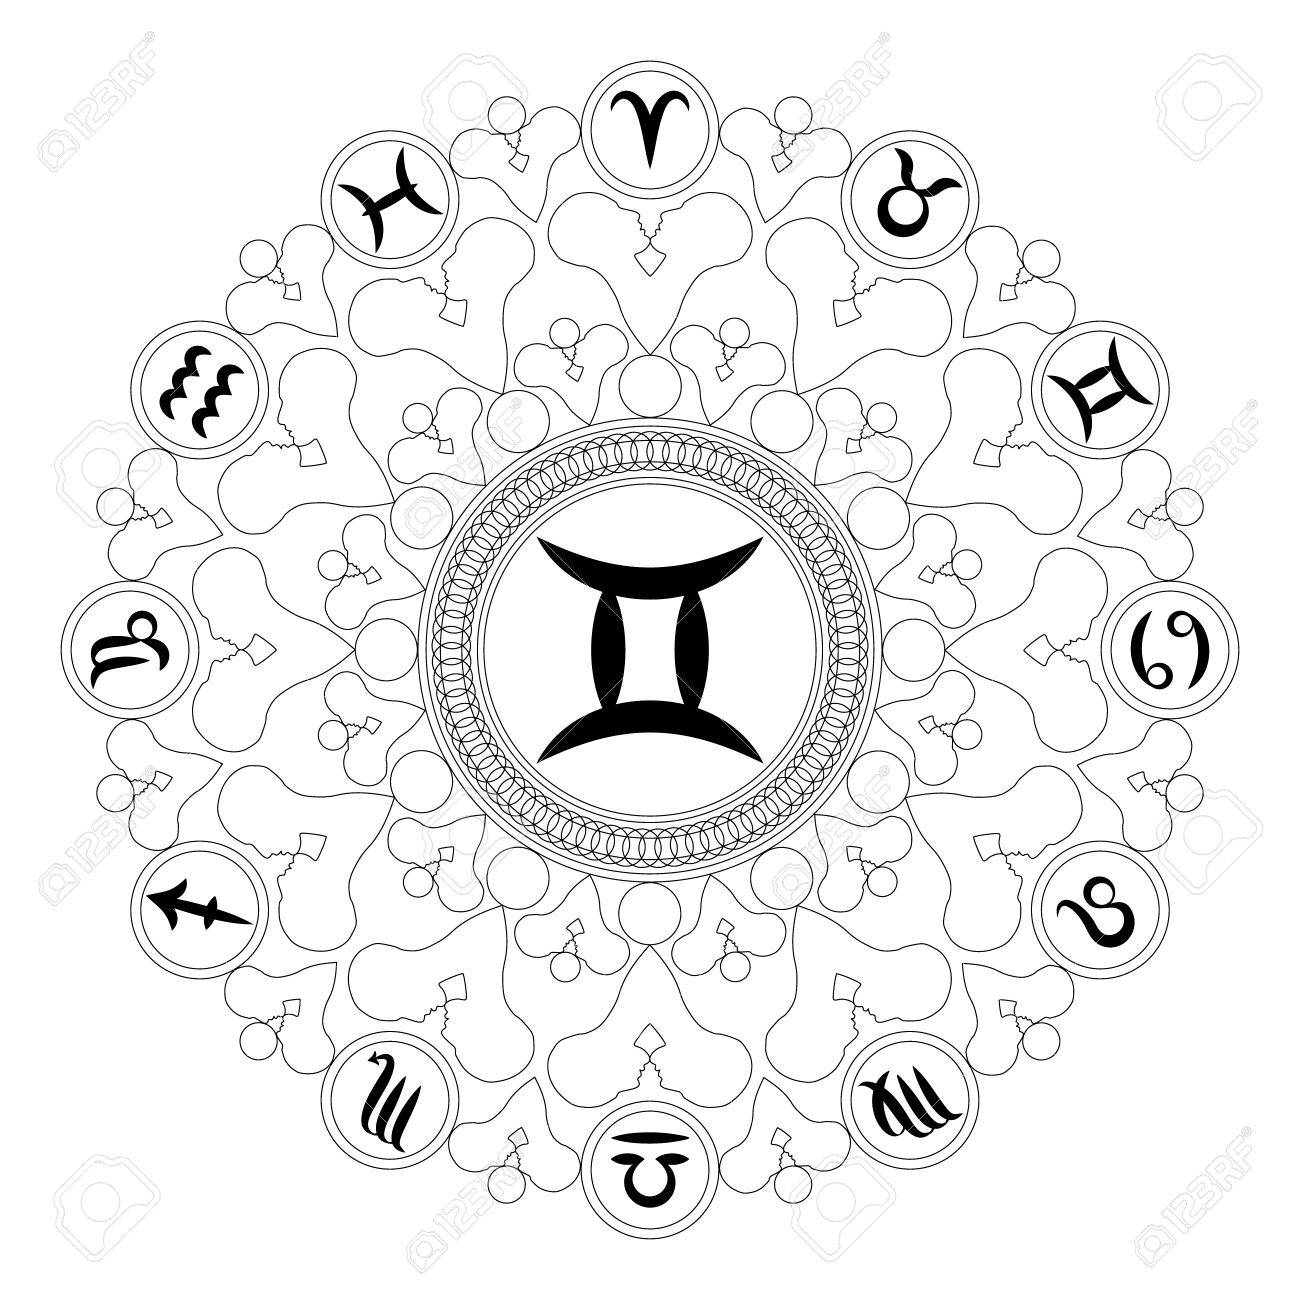 Black and white round geometric mandala with zodiac symbol of black and white round geometric mandala with zodiac symbol of gemini adult coloring book page buycottarizona